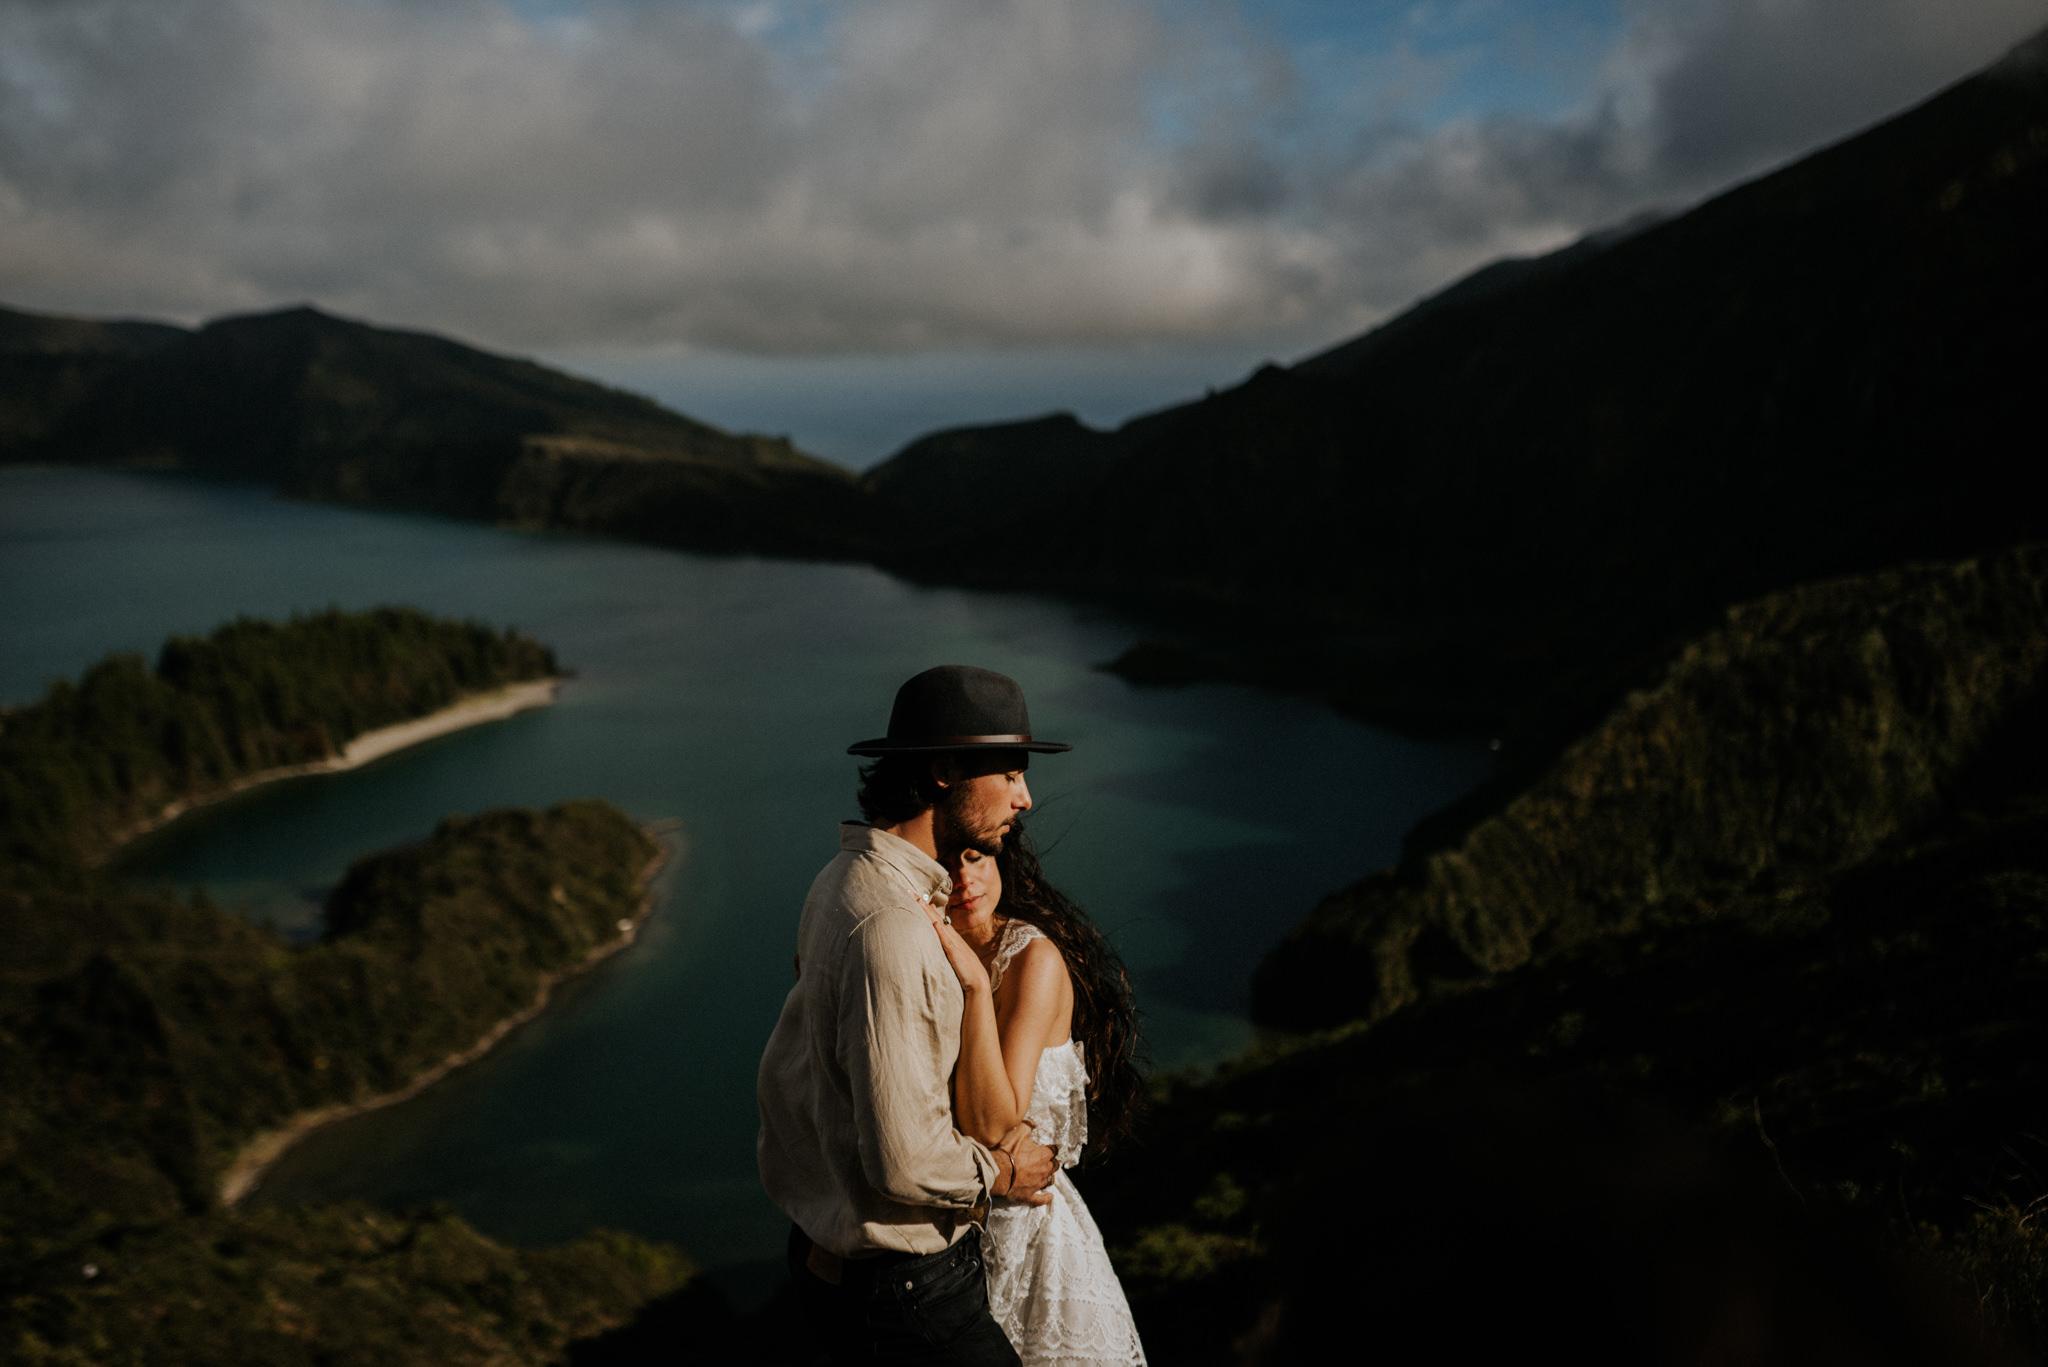 twyla jones photography - azores-.jpg